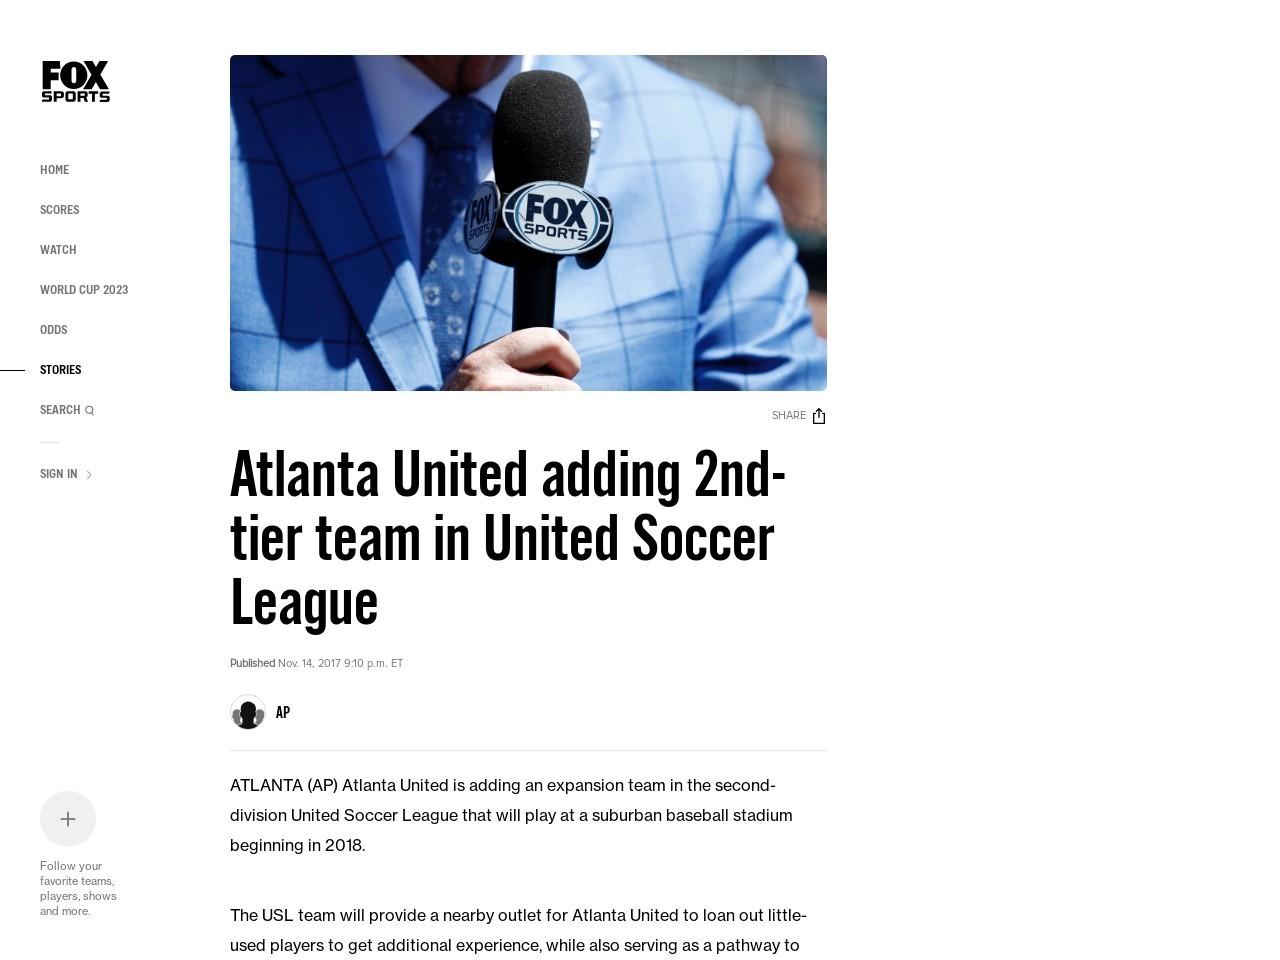 Atlanta United adding 2nd-tier team in United Soccer League